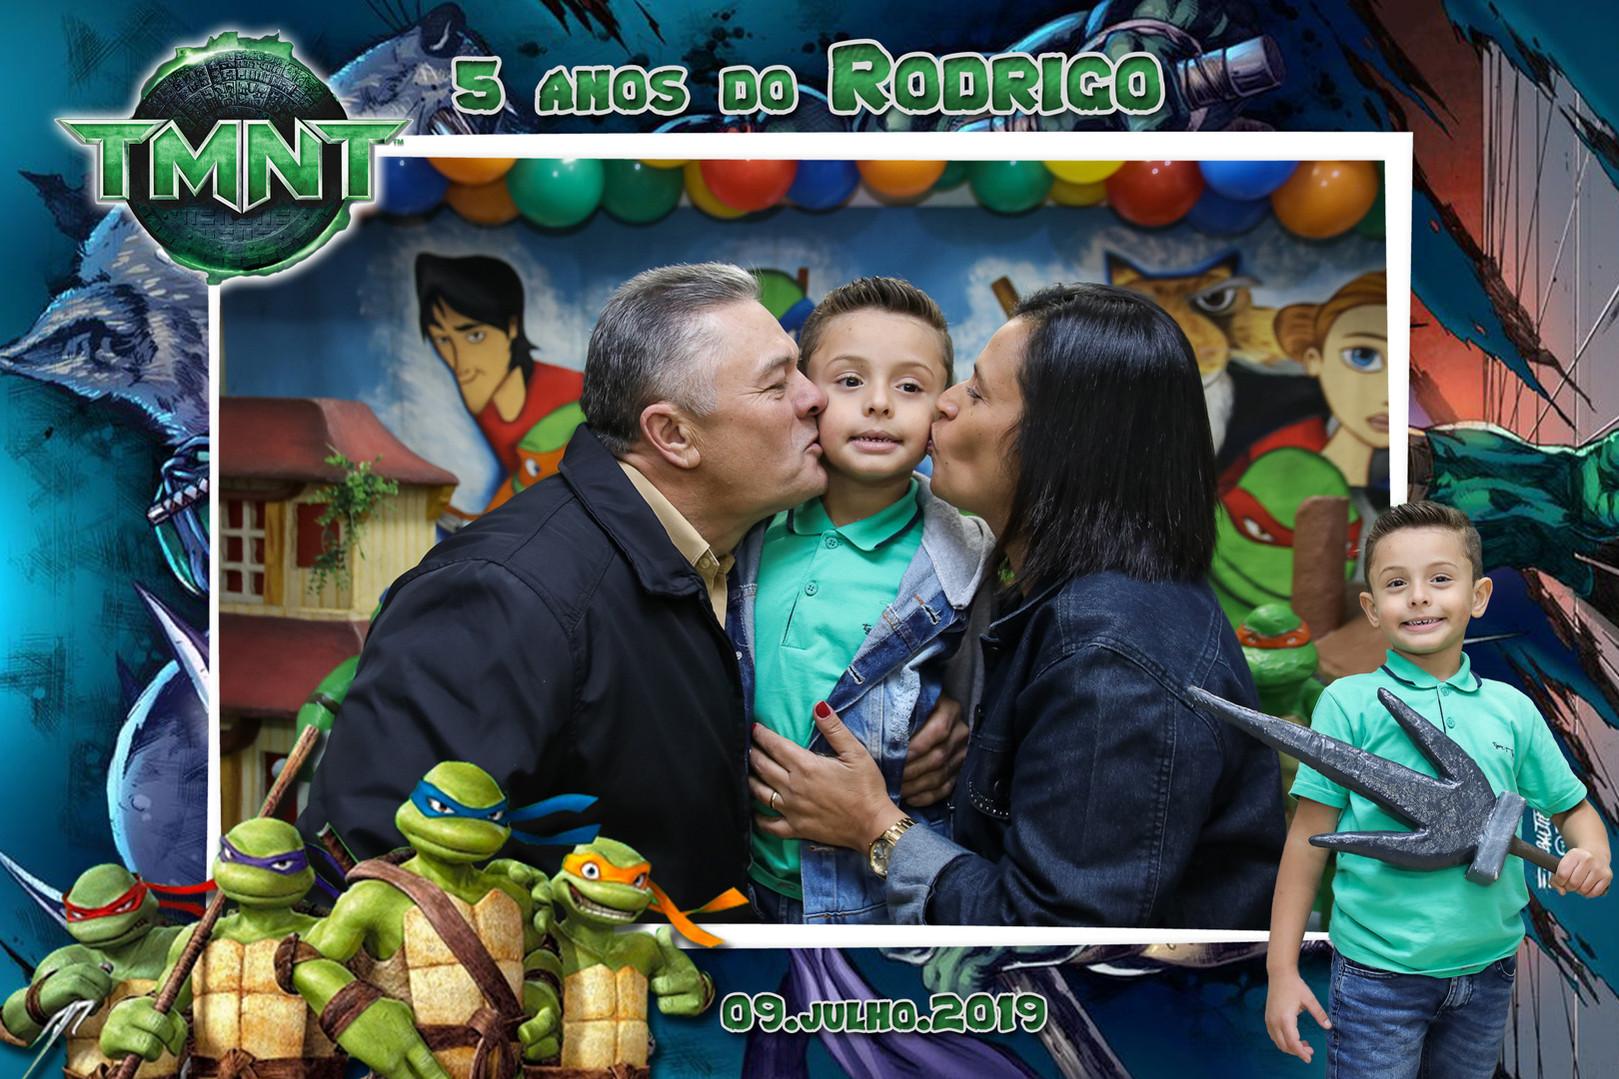 Rodrigo 5 anos (7).jpg